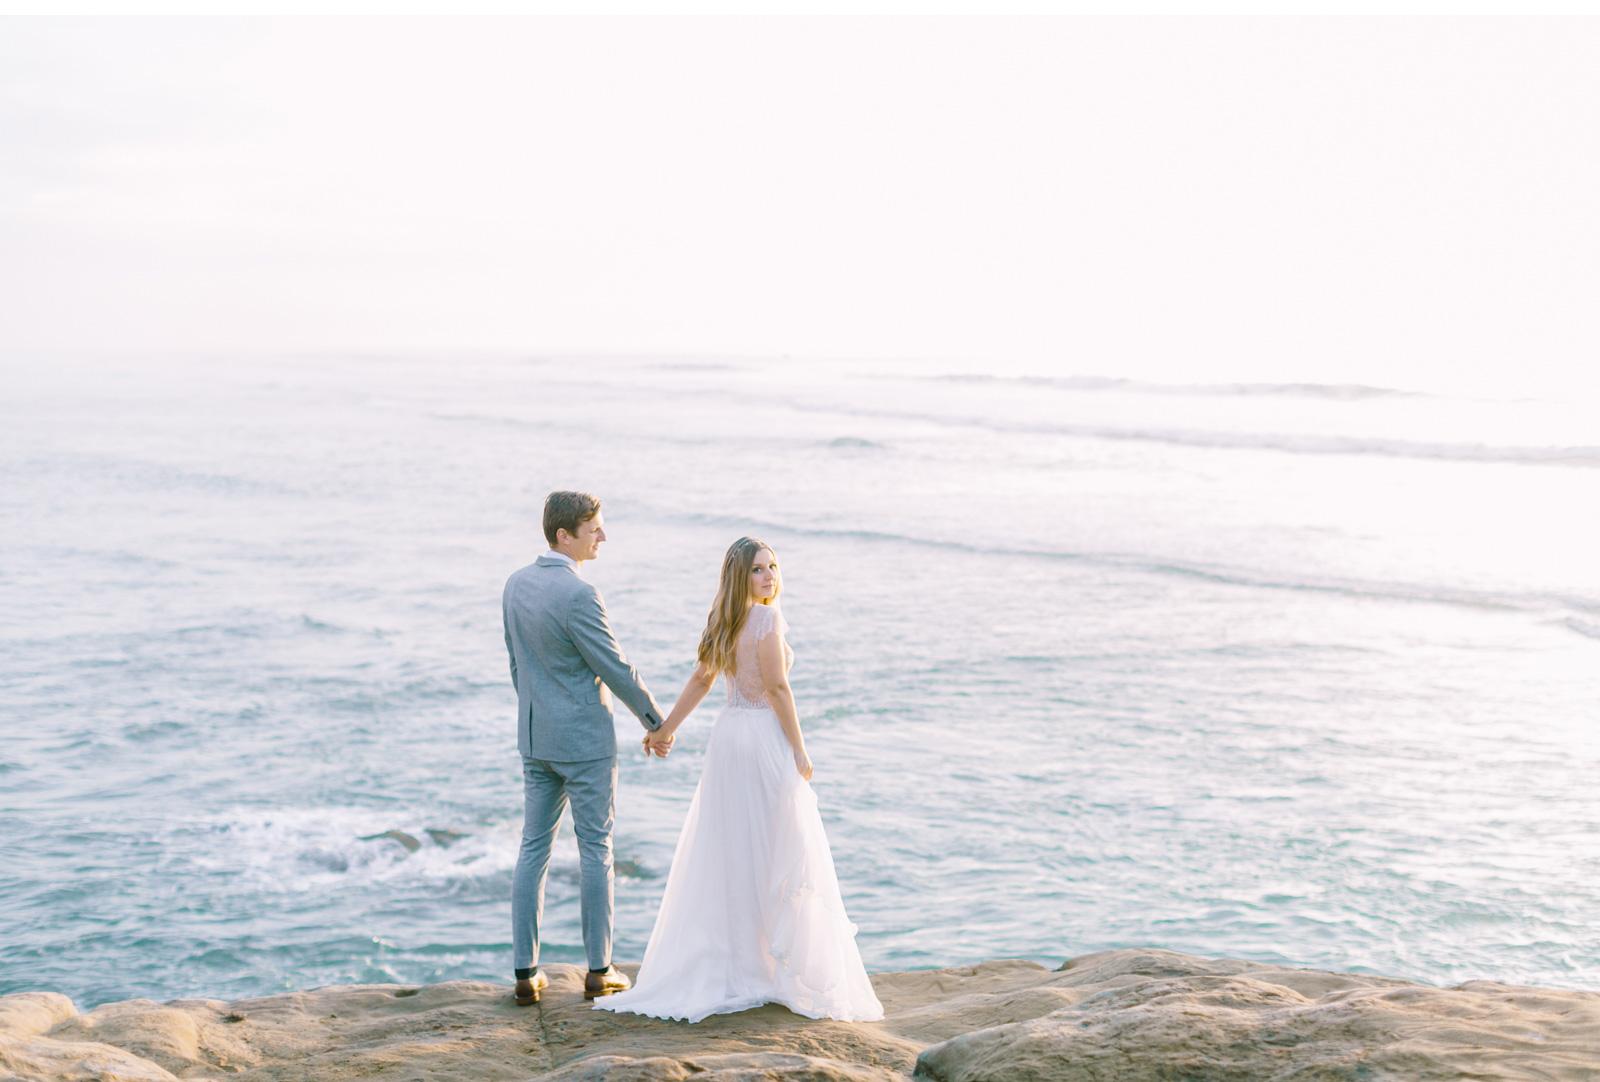 Hawaii-Fine-Art-Wedding-Photographer-Natalie-Schutt-Photography-Style-Me-Pretty_13.jpg